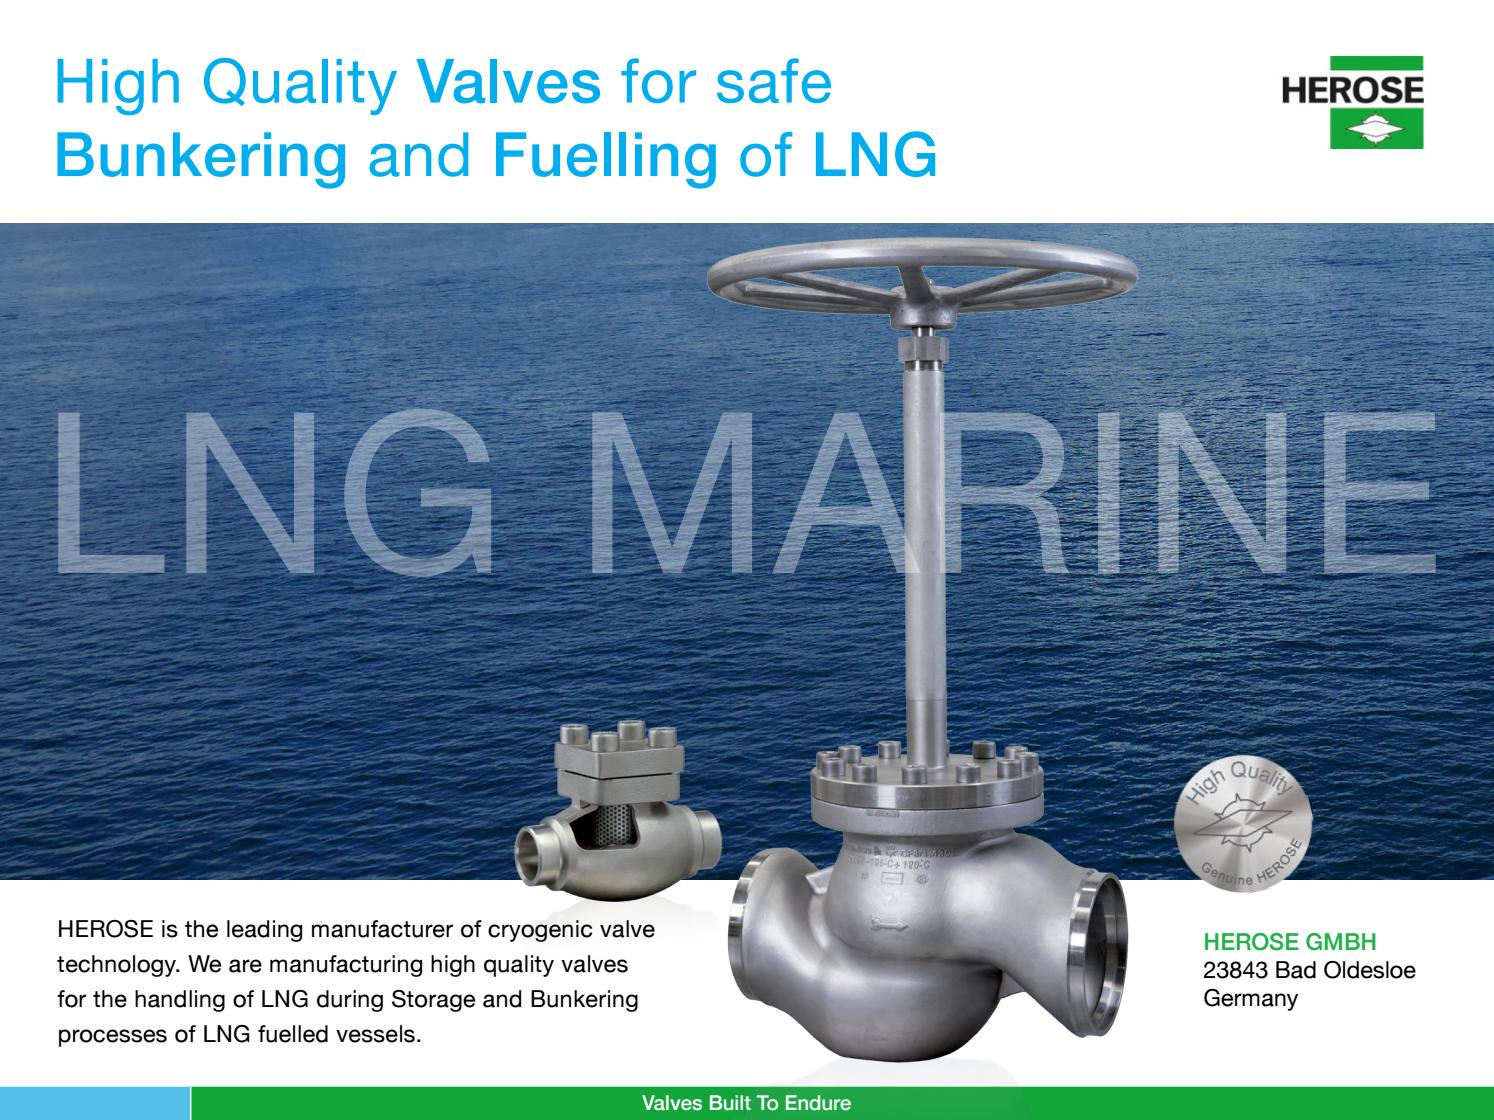 LNG World Shipping March/April 2018 by rivieramaritimemedia